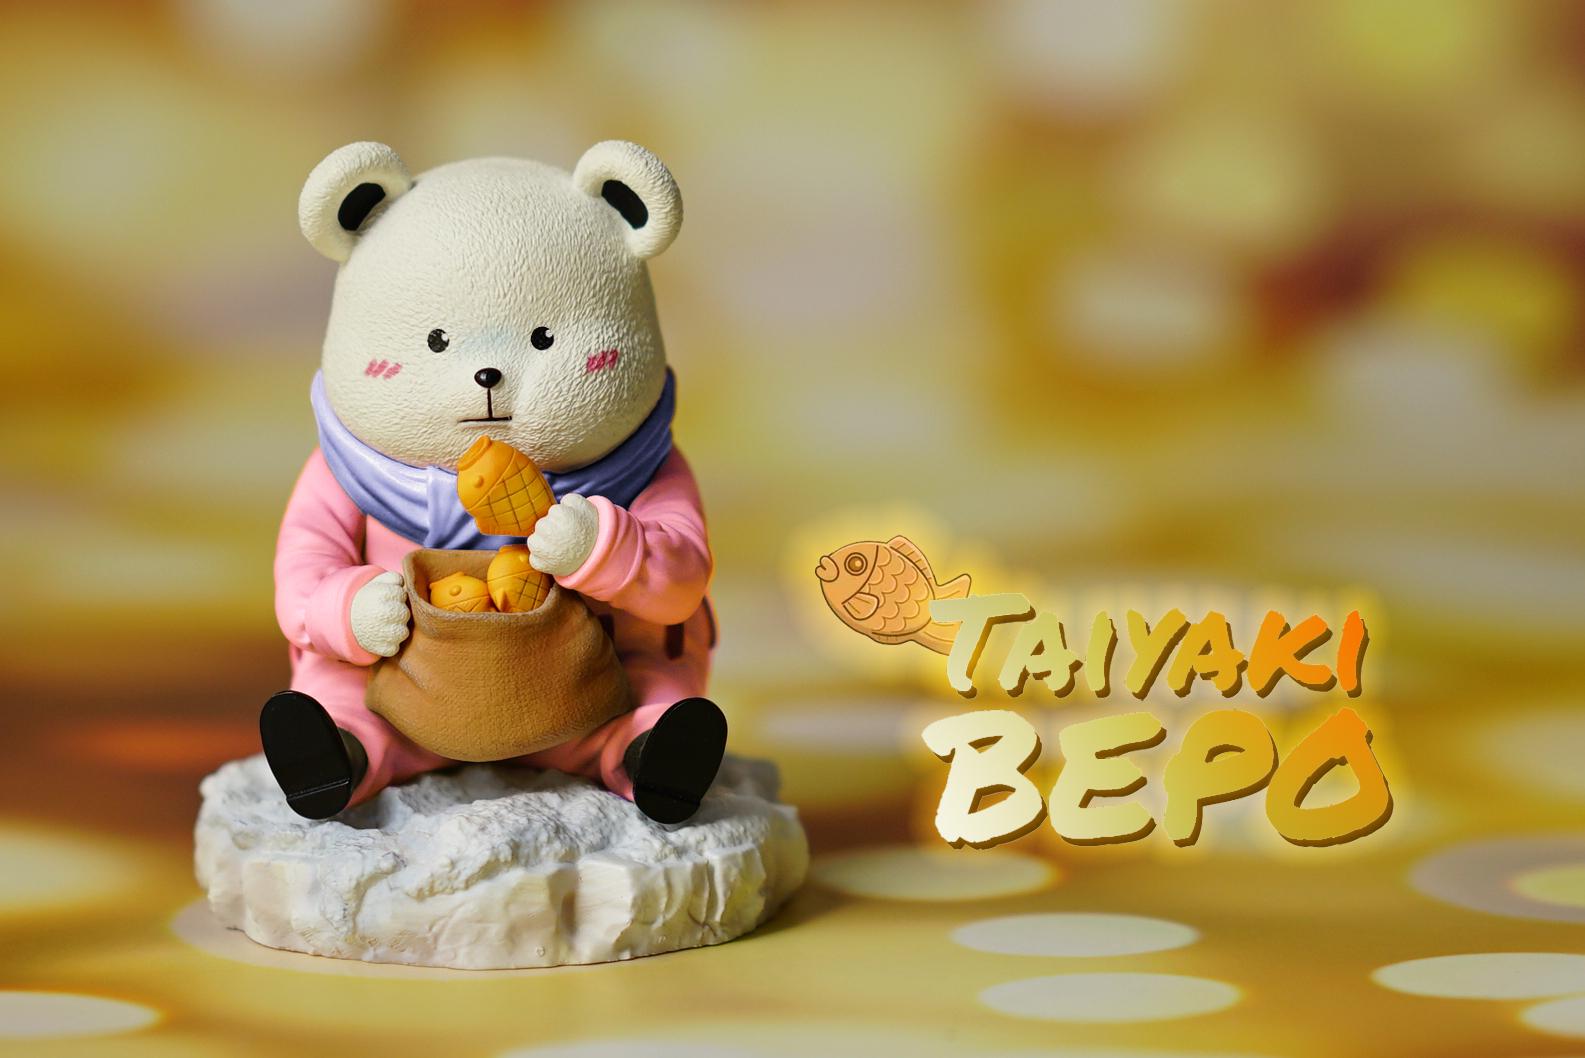 Pink BEPO น้องหมี x ขนมไทยากิ  A+ Studio (มัดจำ)